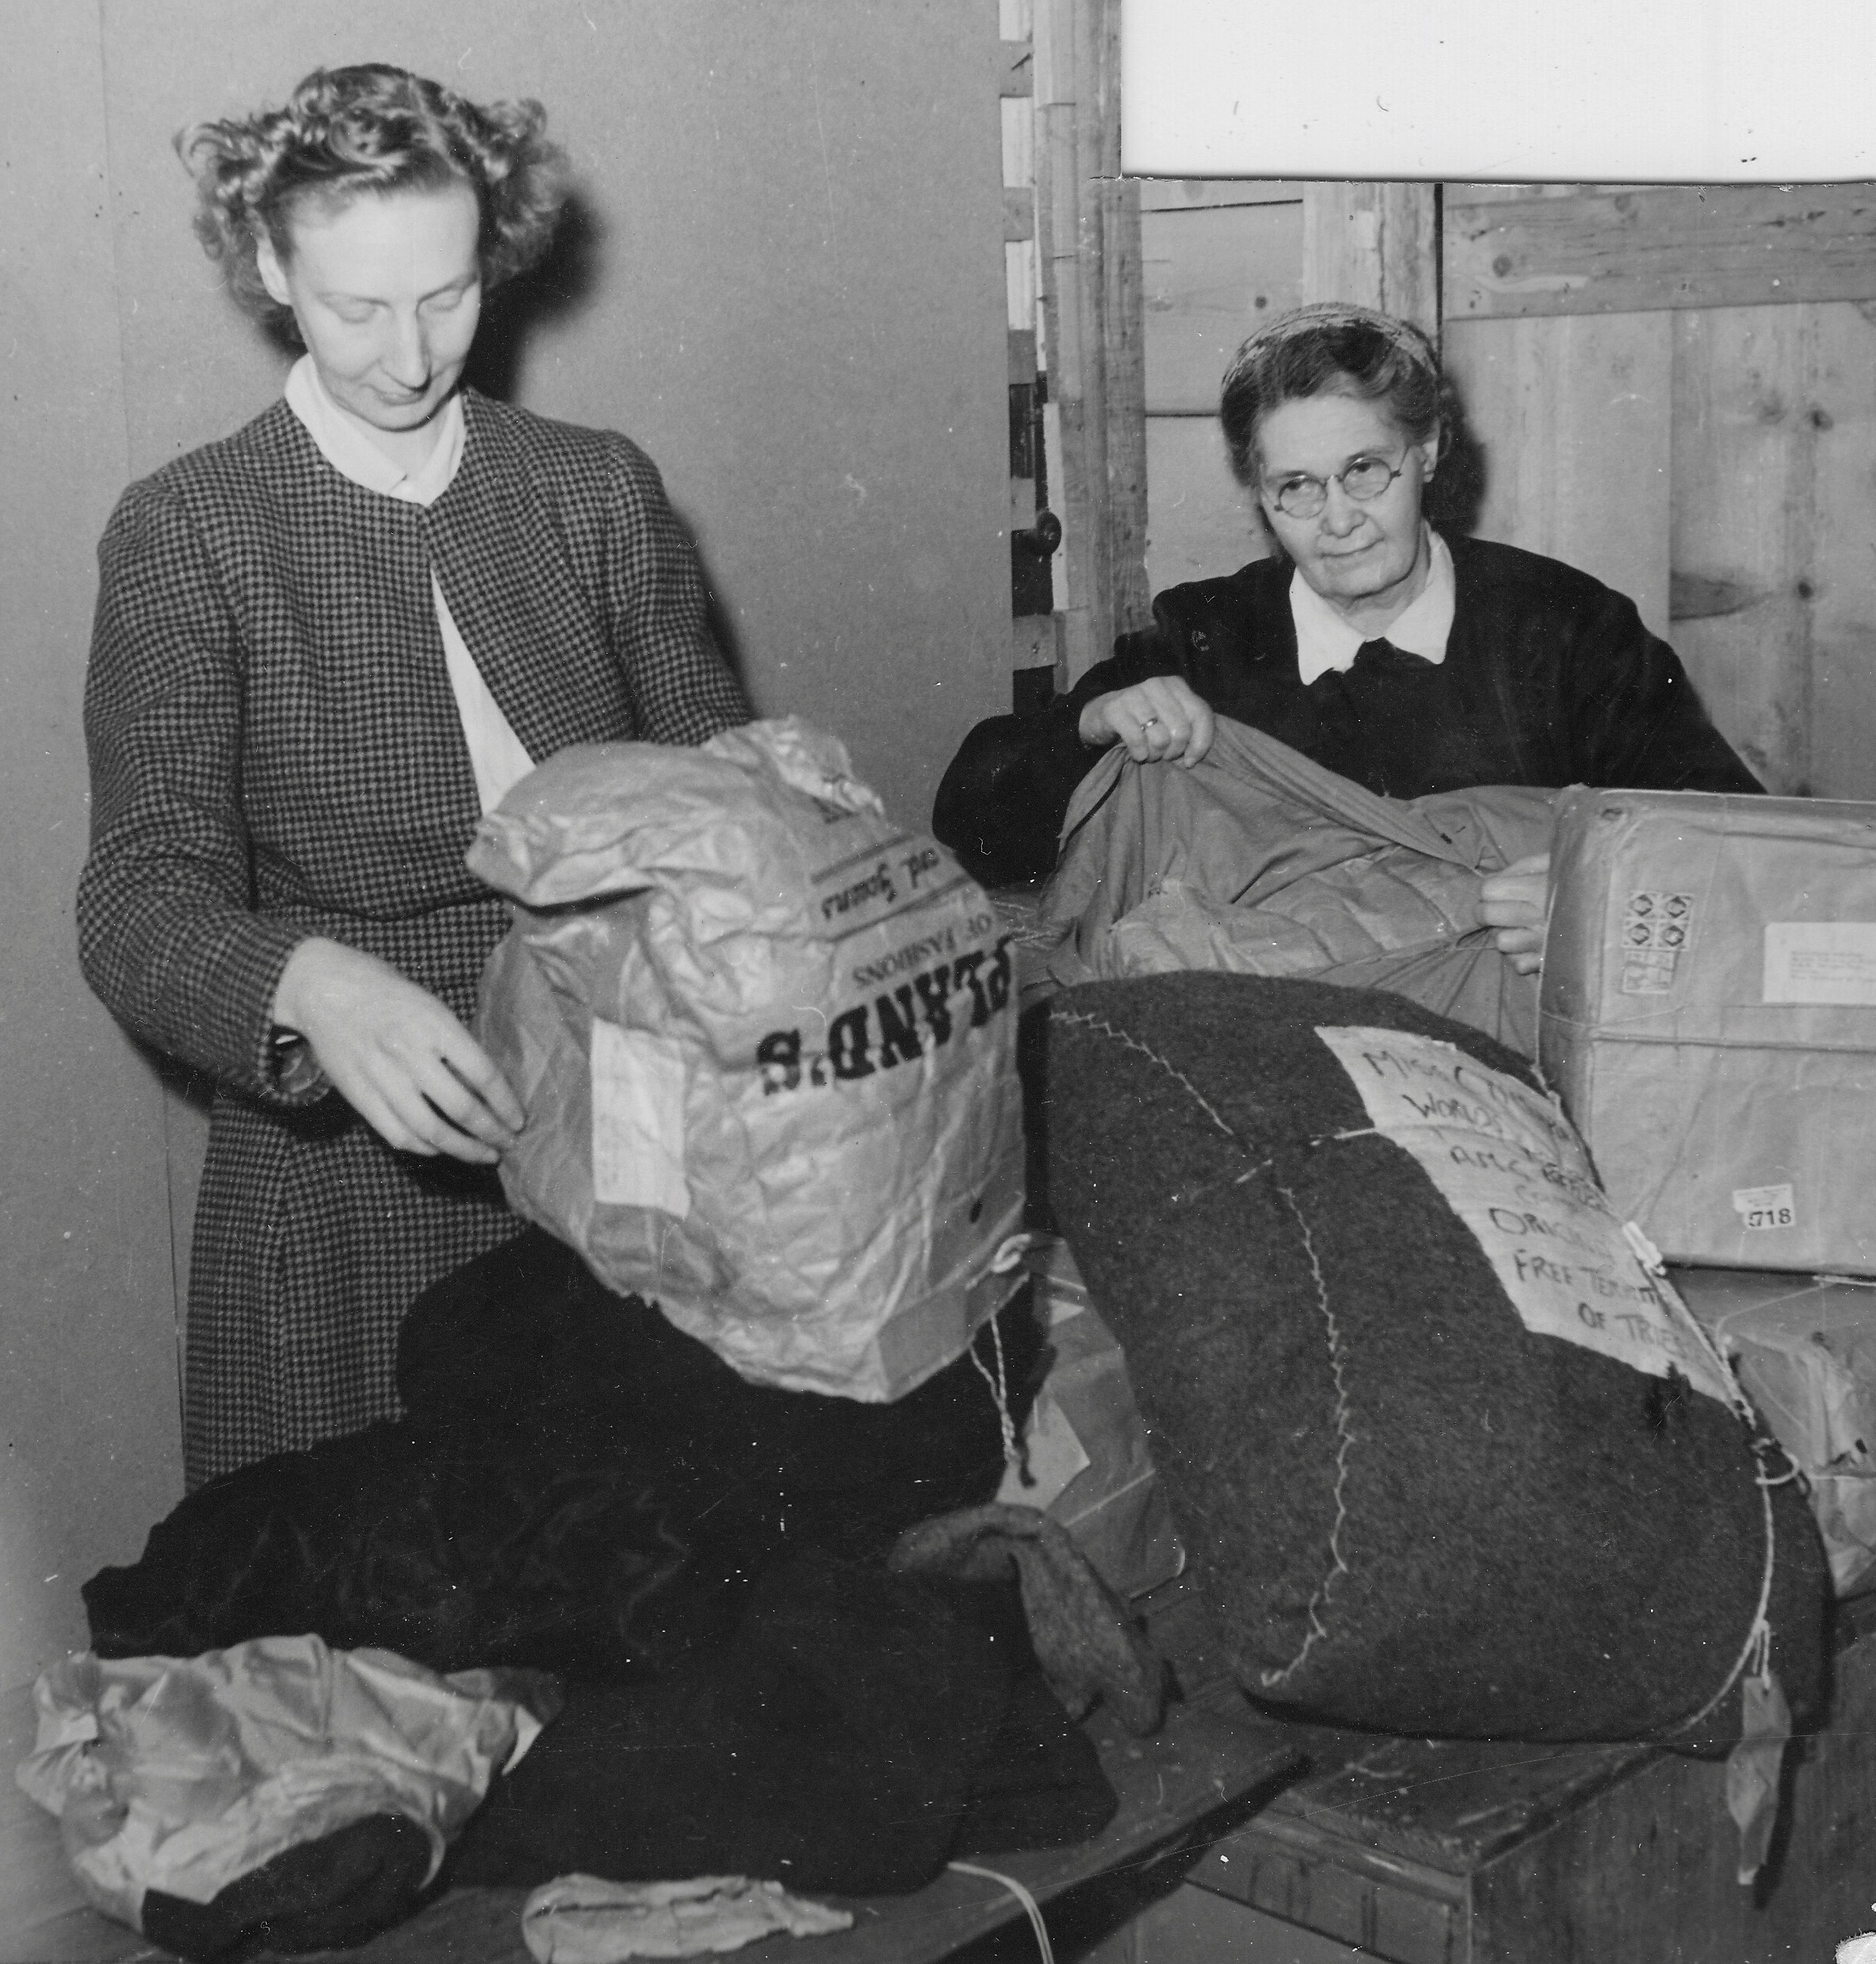 San Sabba clothing distribution Clare McMurray 1950-51